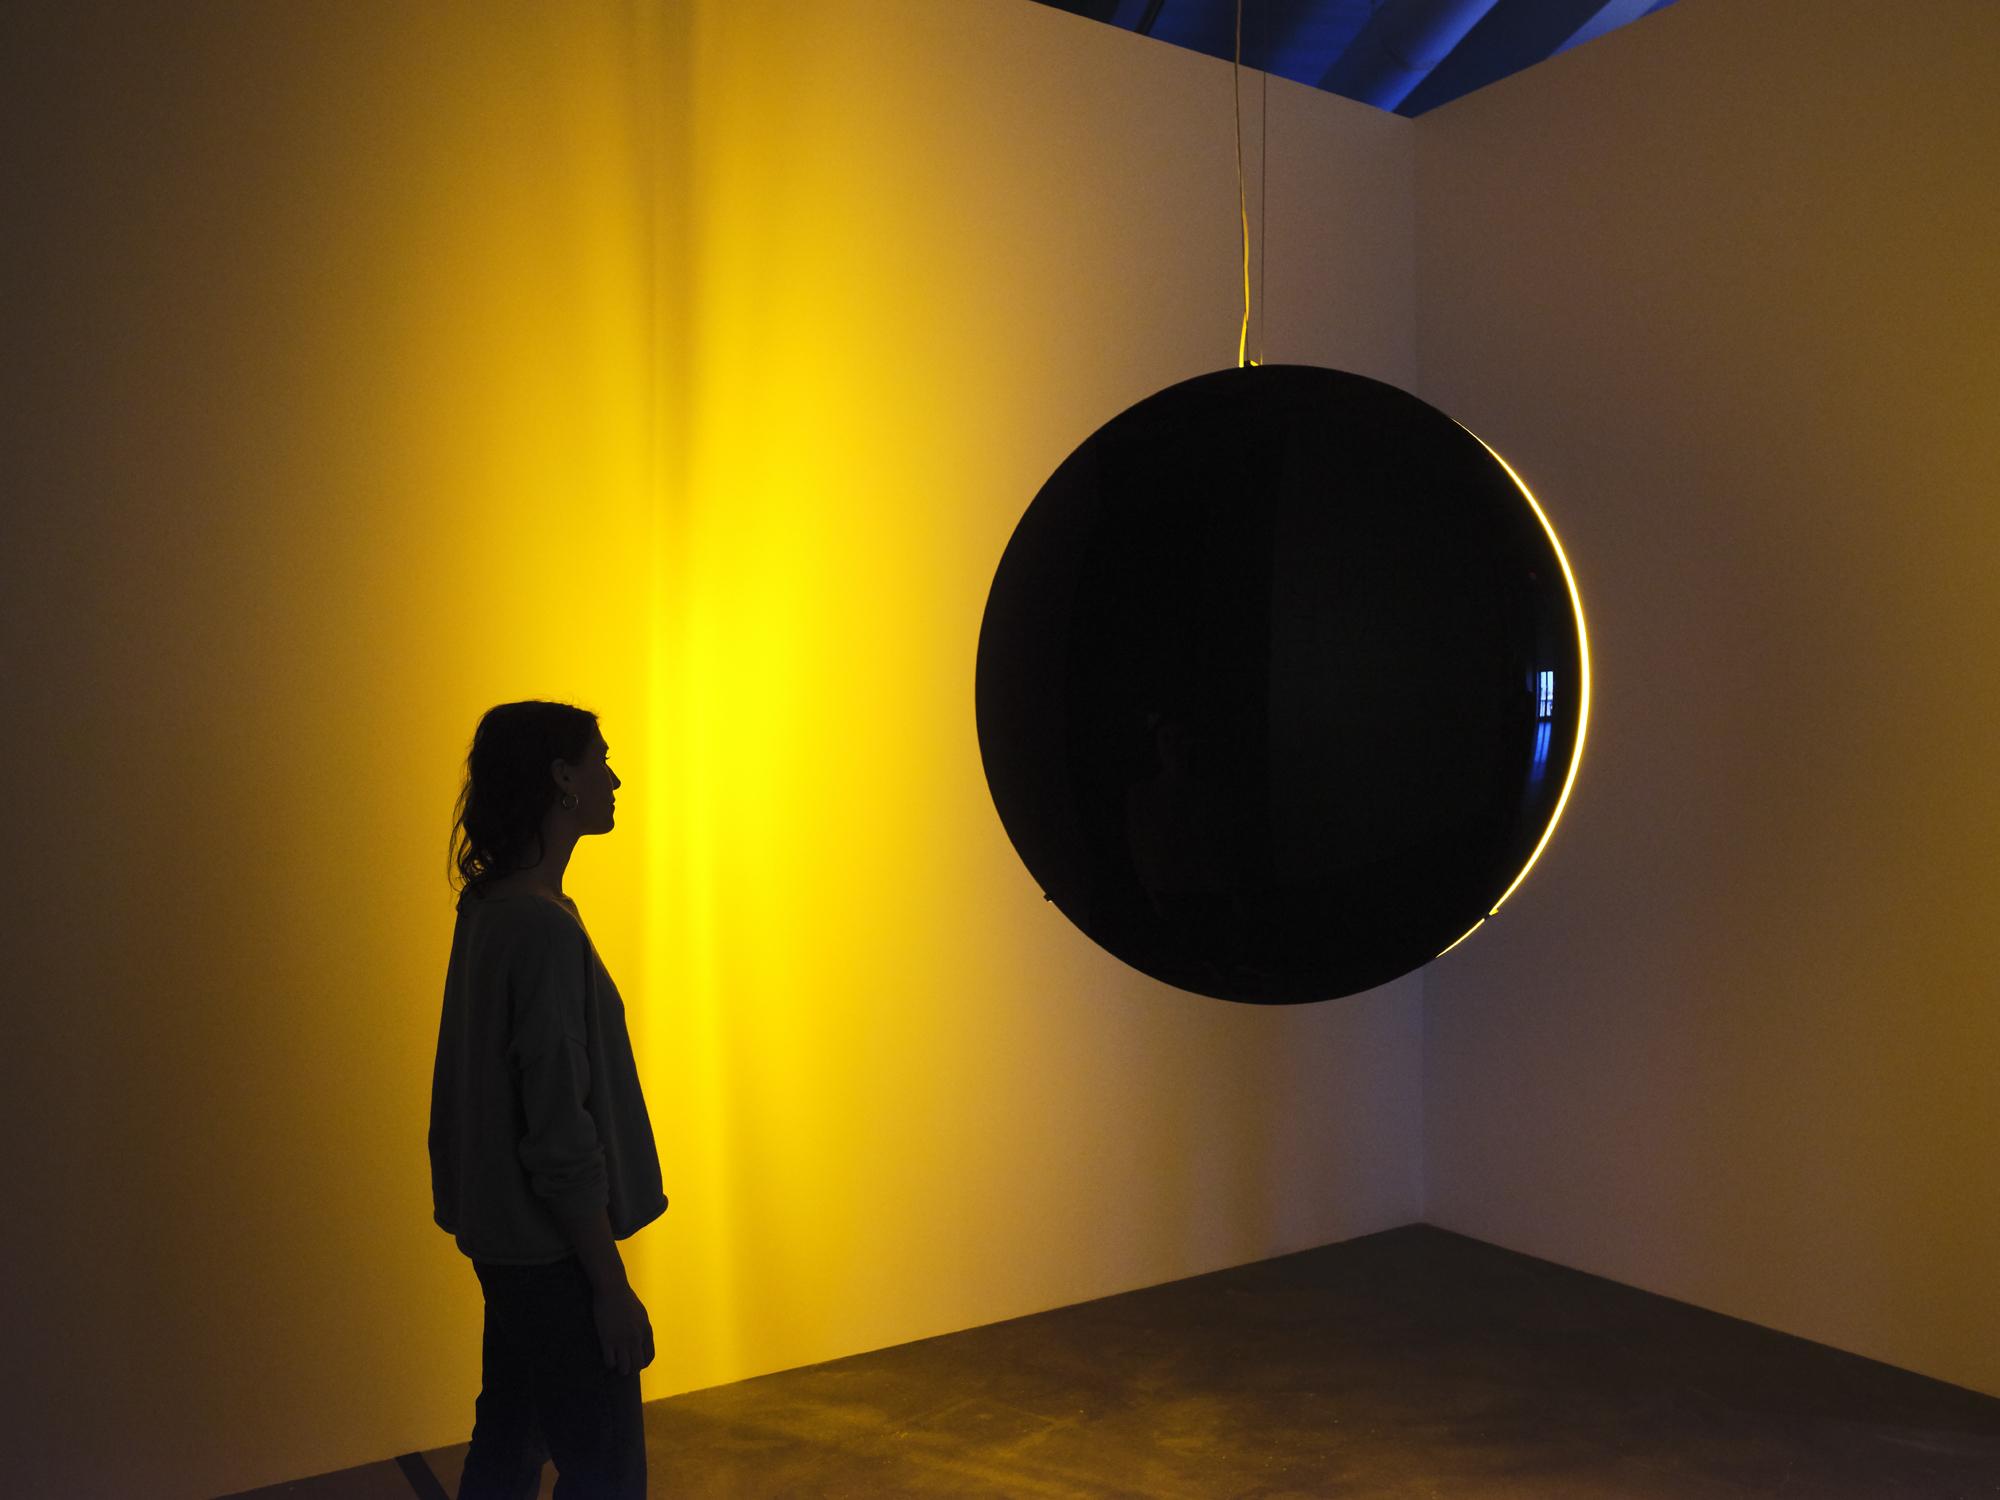 A shadowed figure observes a spherical black light sculpture emitting a soft golden hue